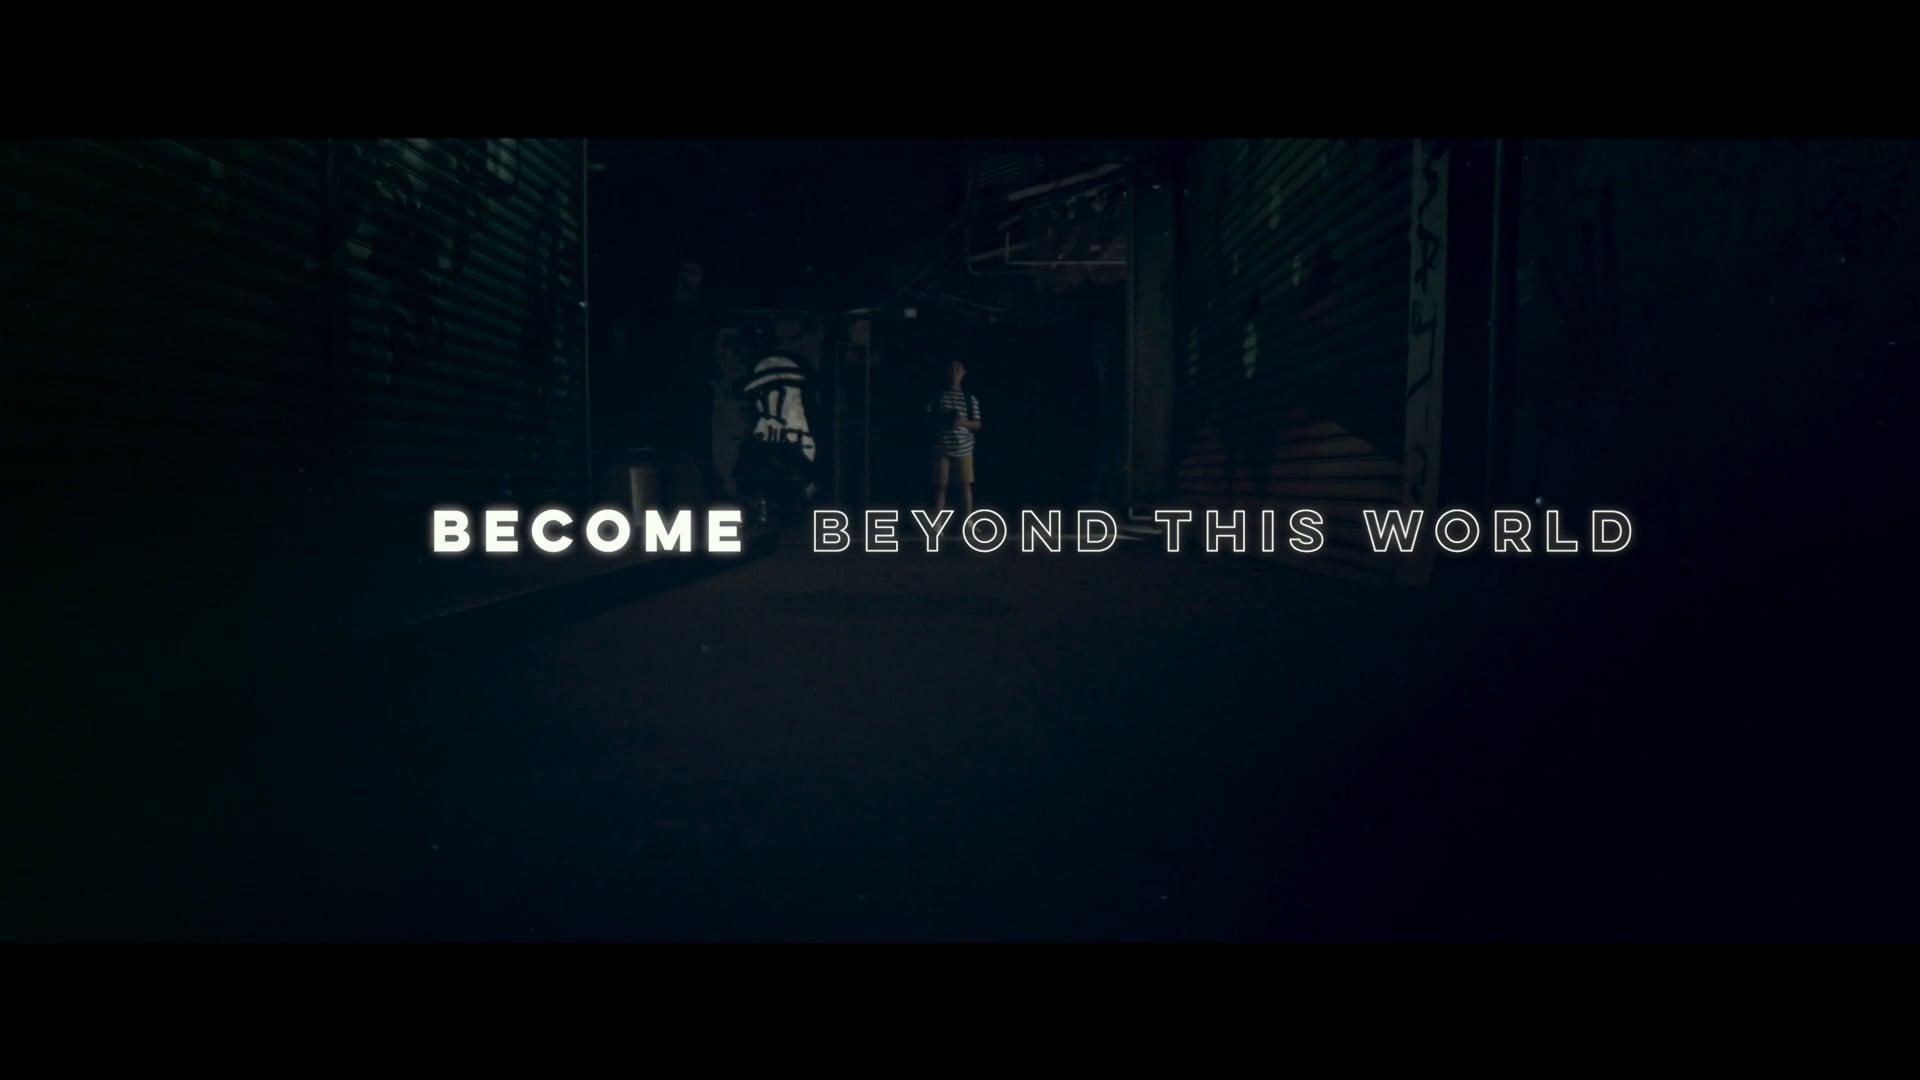 BECOME beyond this world